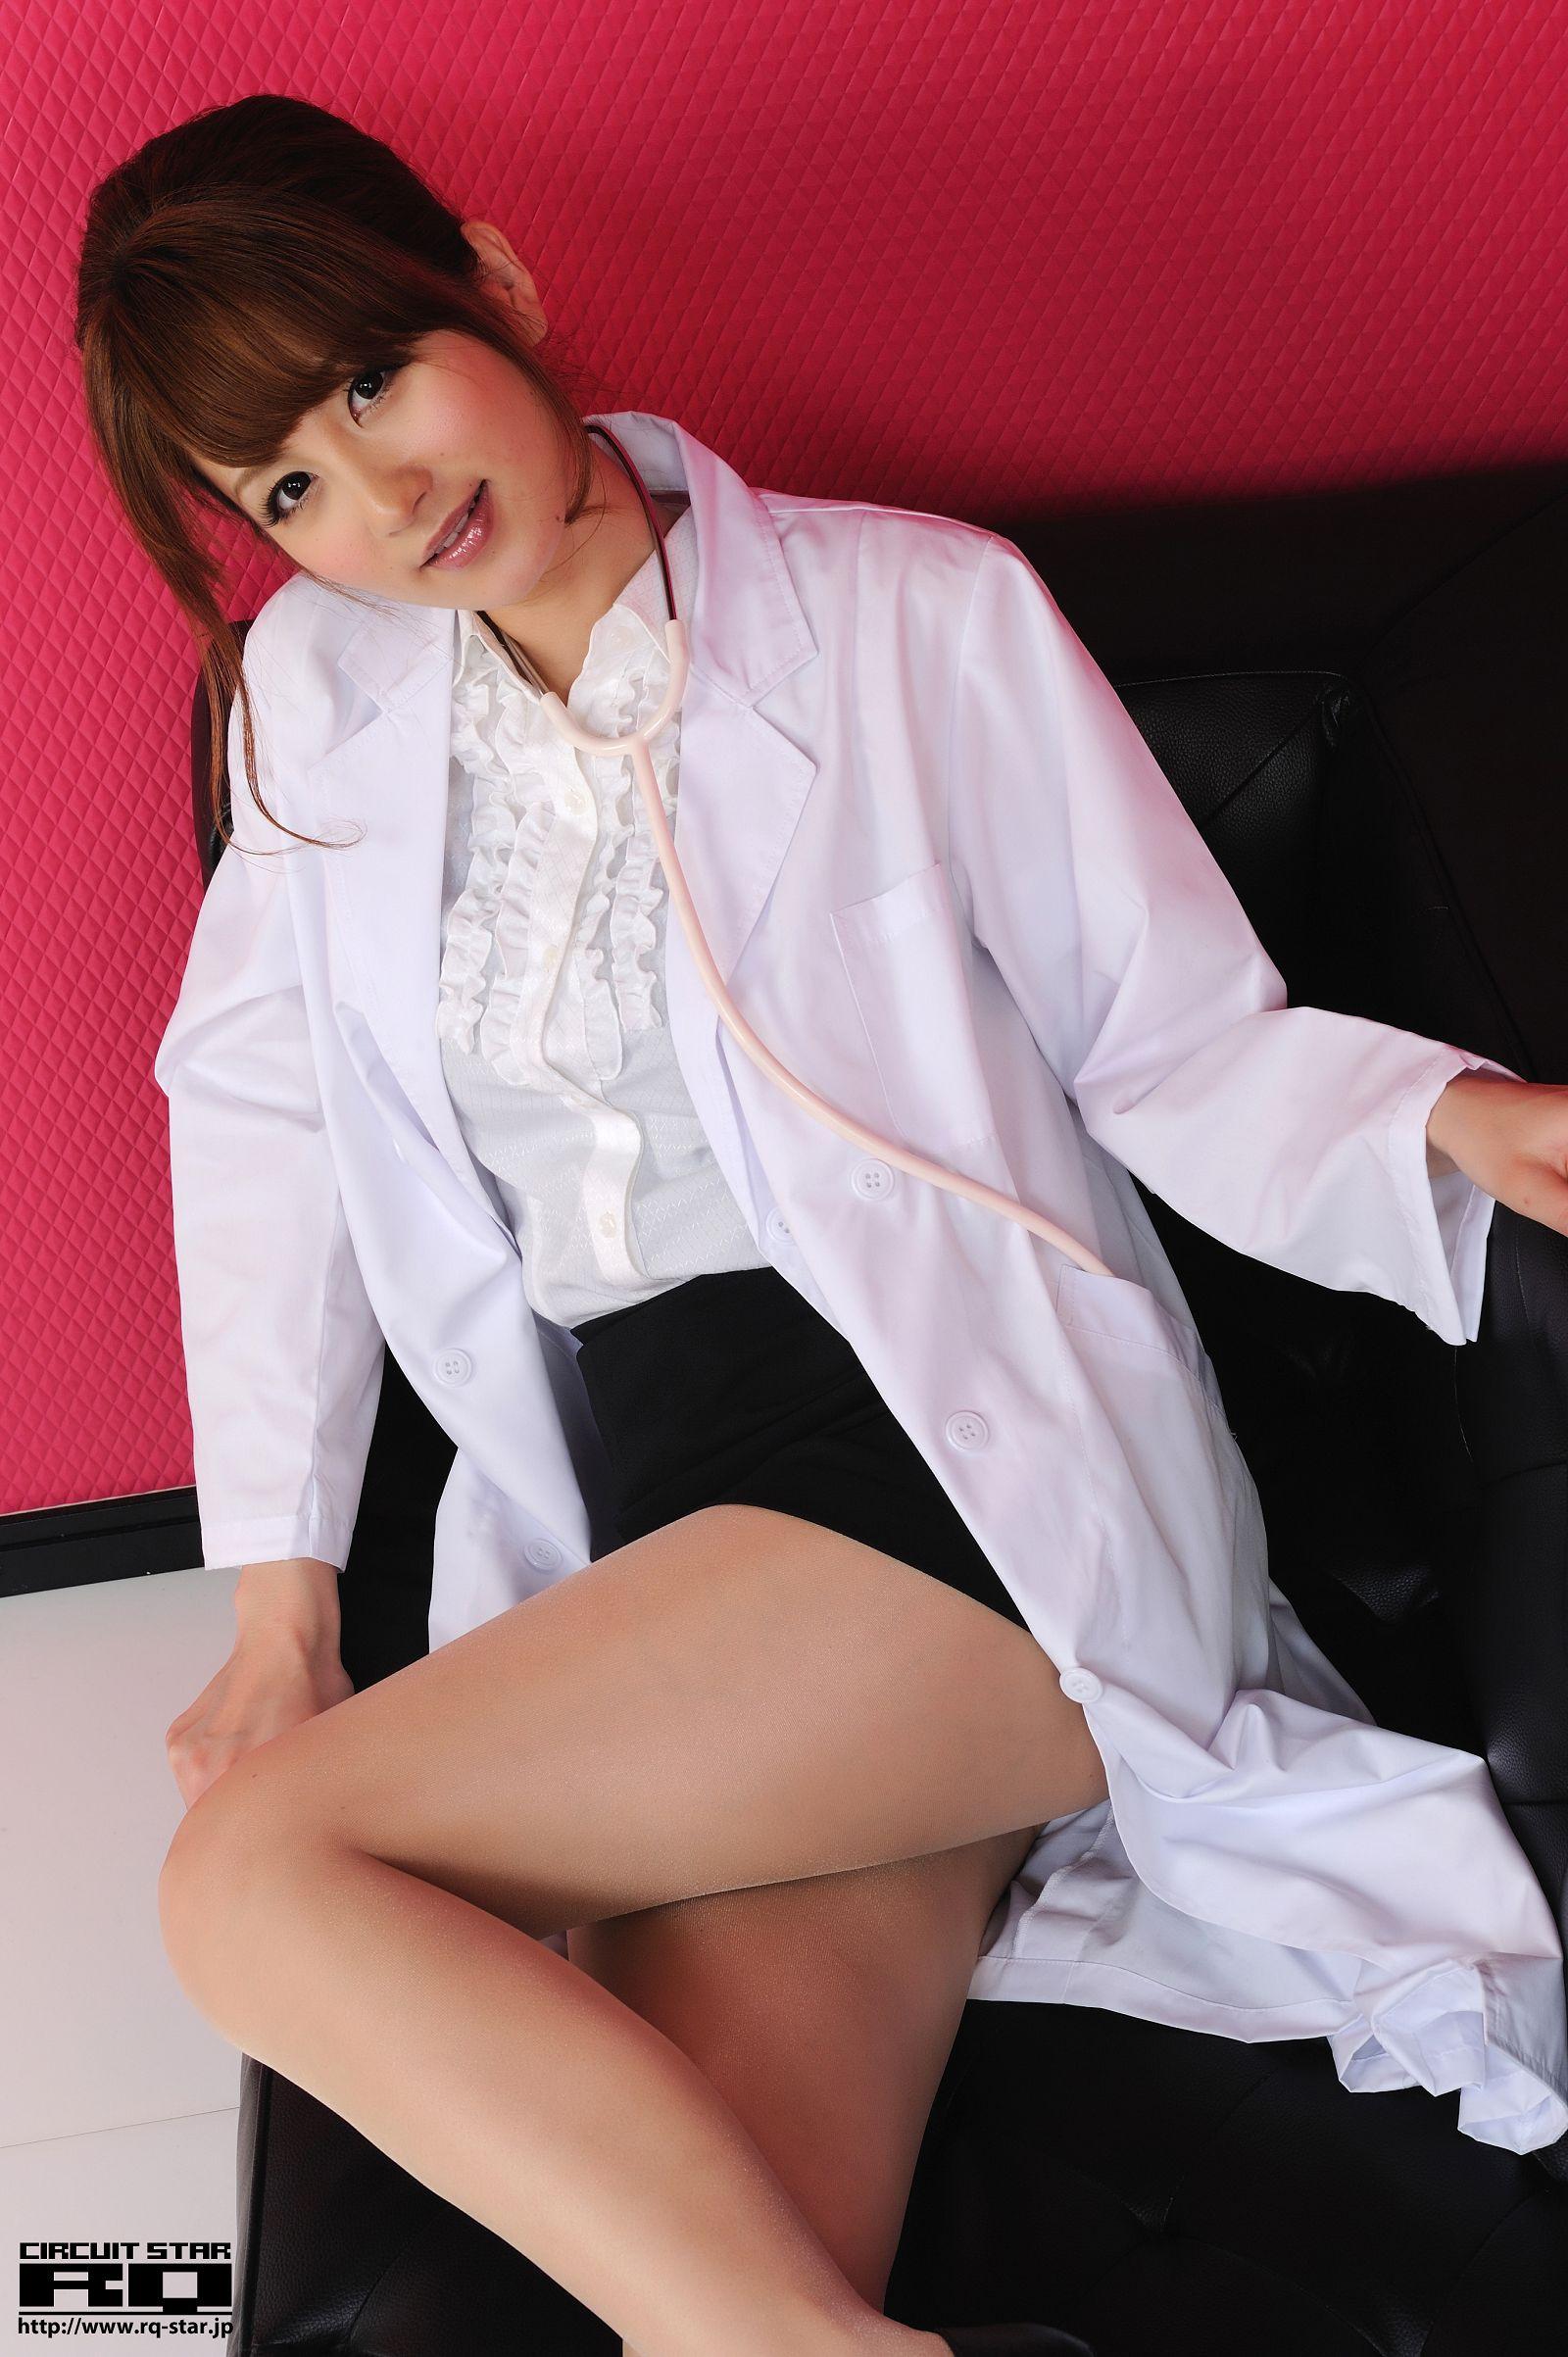 [RQ STAR美女] NO.00633 Maasa Maeda 前田真麻 Doctor Maasa[110P] RQ STAR 第4张